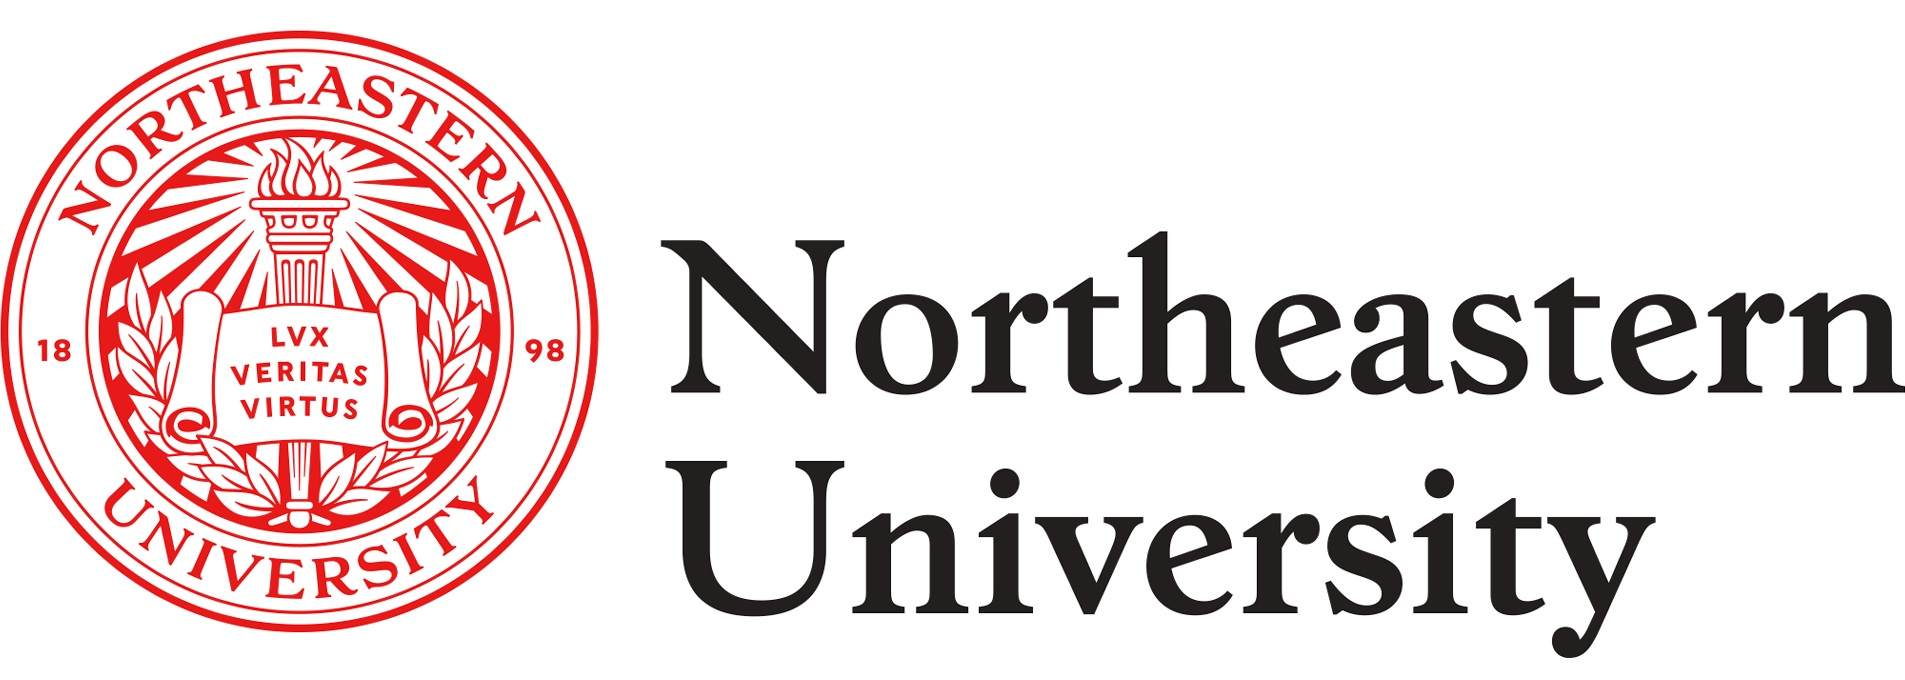 northeastern_university_logo.png